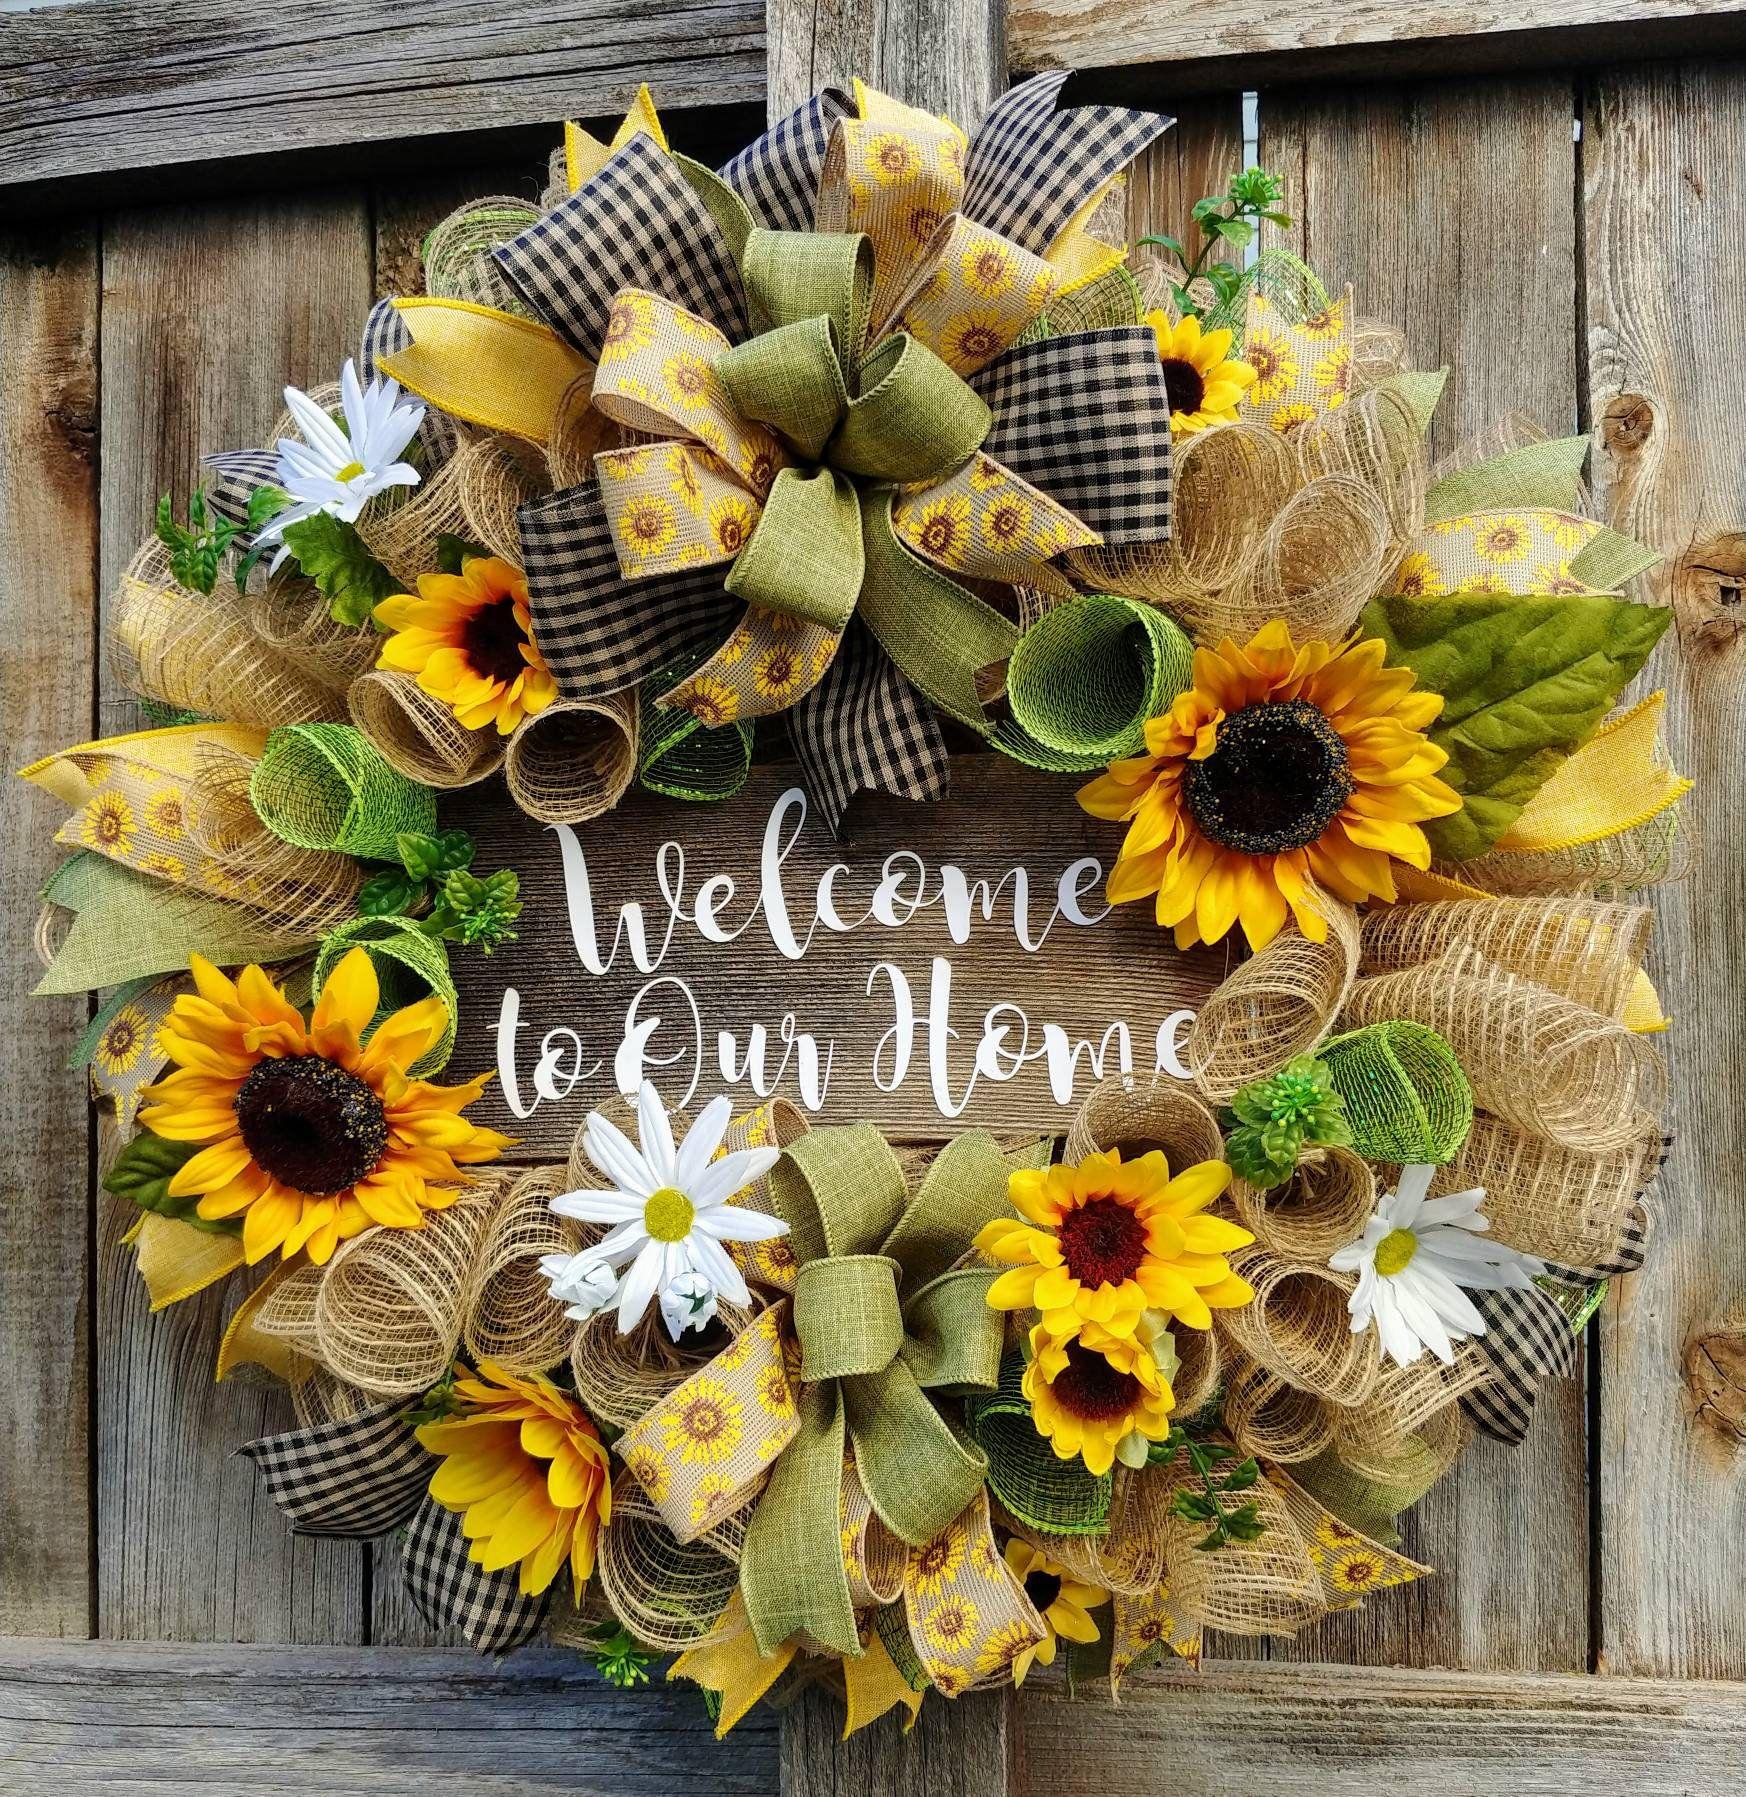 Photo of Sunflower wreath, welcome wreath, summer wreath, welcome to our home wreath, sunflower burlap wreath, sunflower welcome wreath